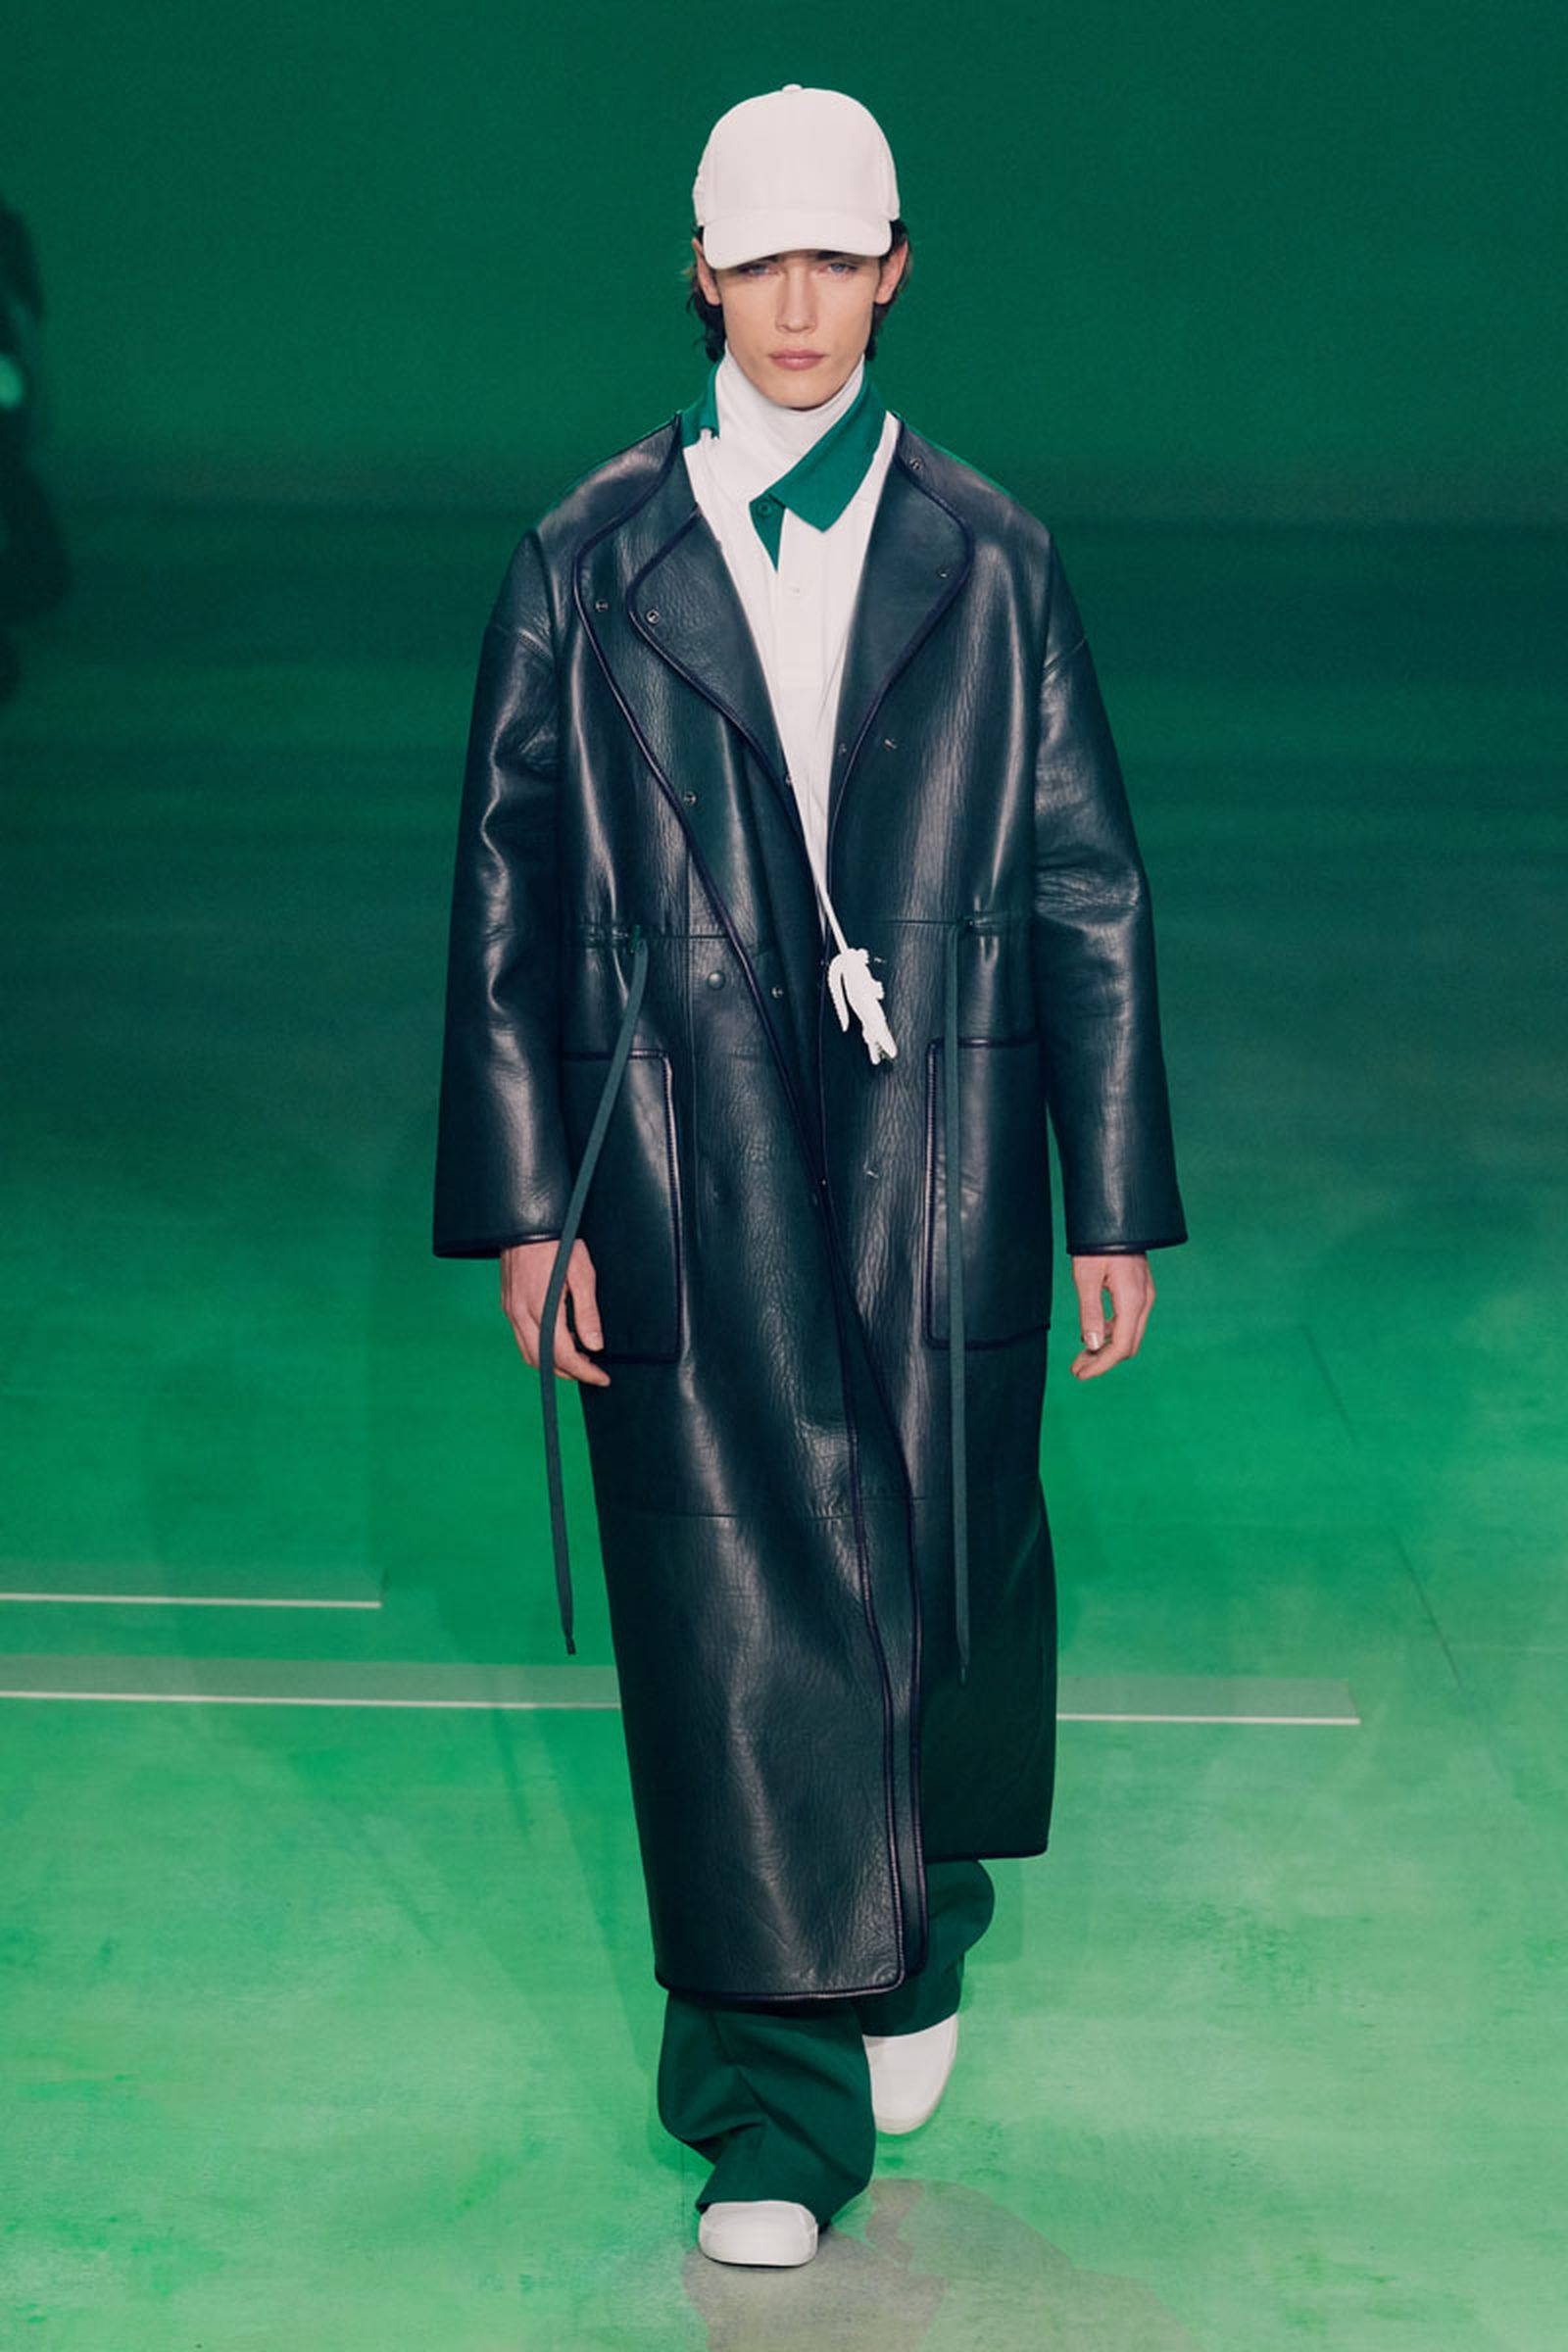 42lascoste fw19 paris fashion week Louise Trotter lacoste runway